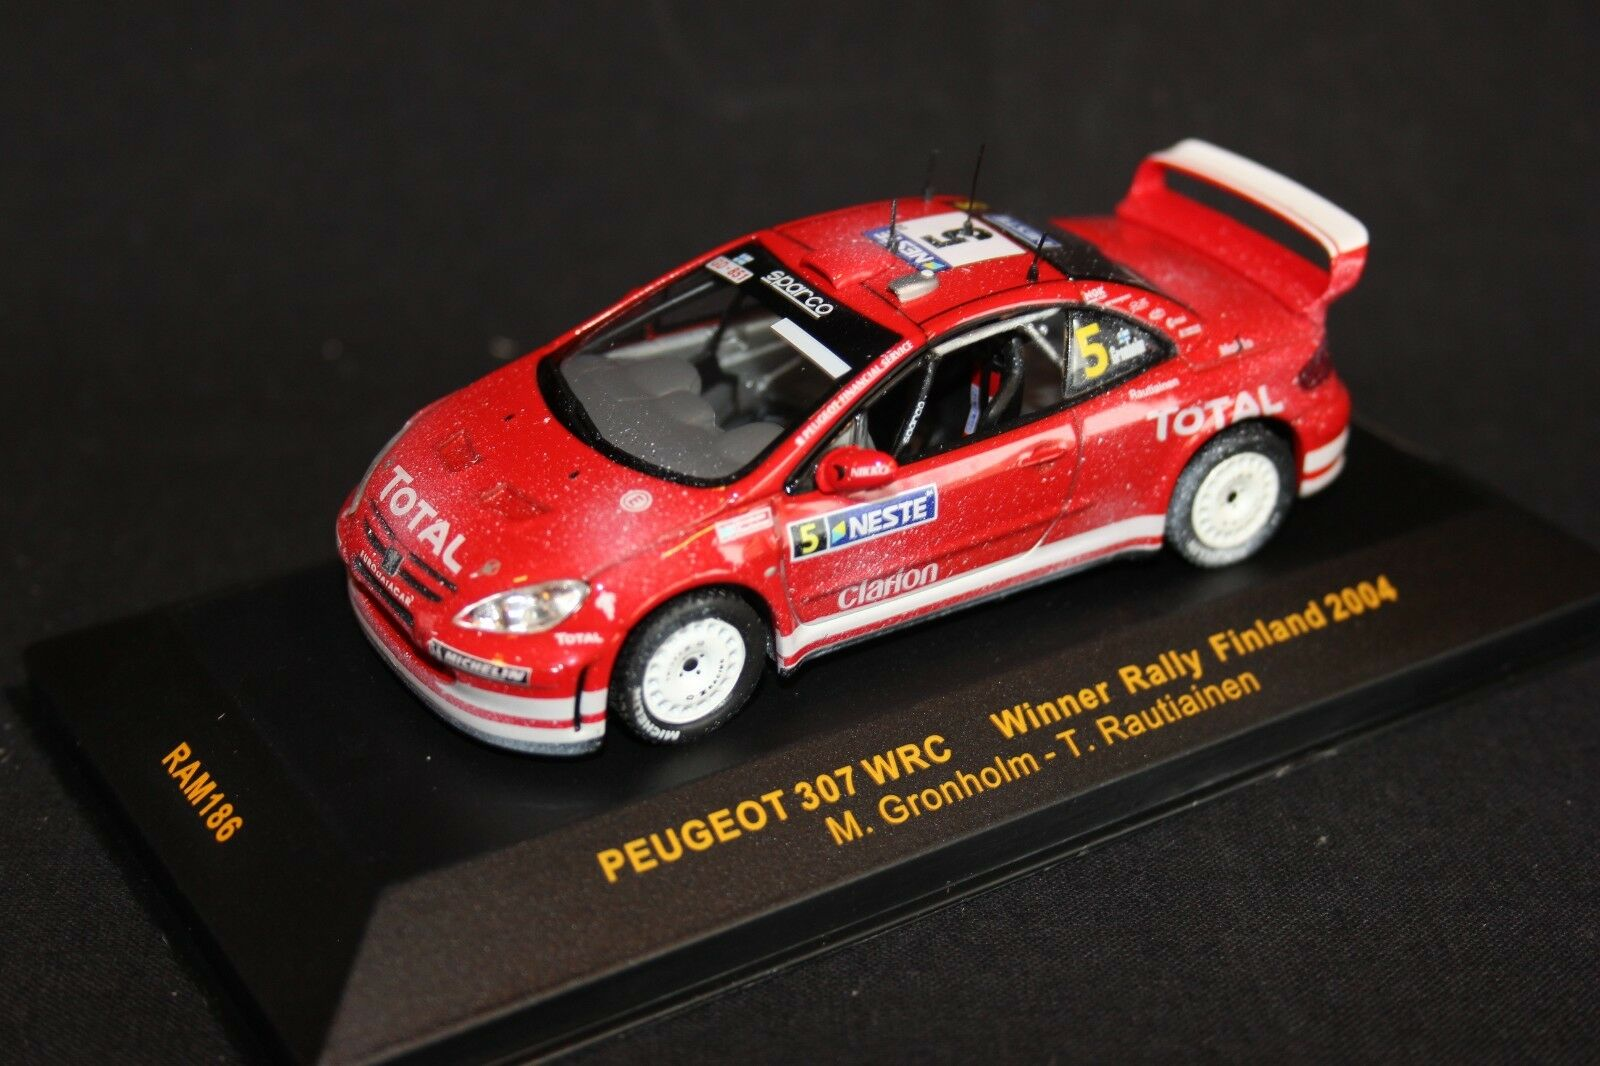 Ixo peugeot 307 wrc 2004 1 43   5 gr ö nholm   rautiainen gewinner finnland - rallye